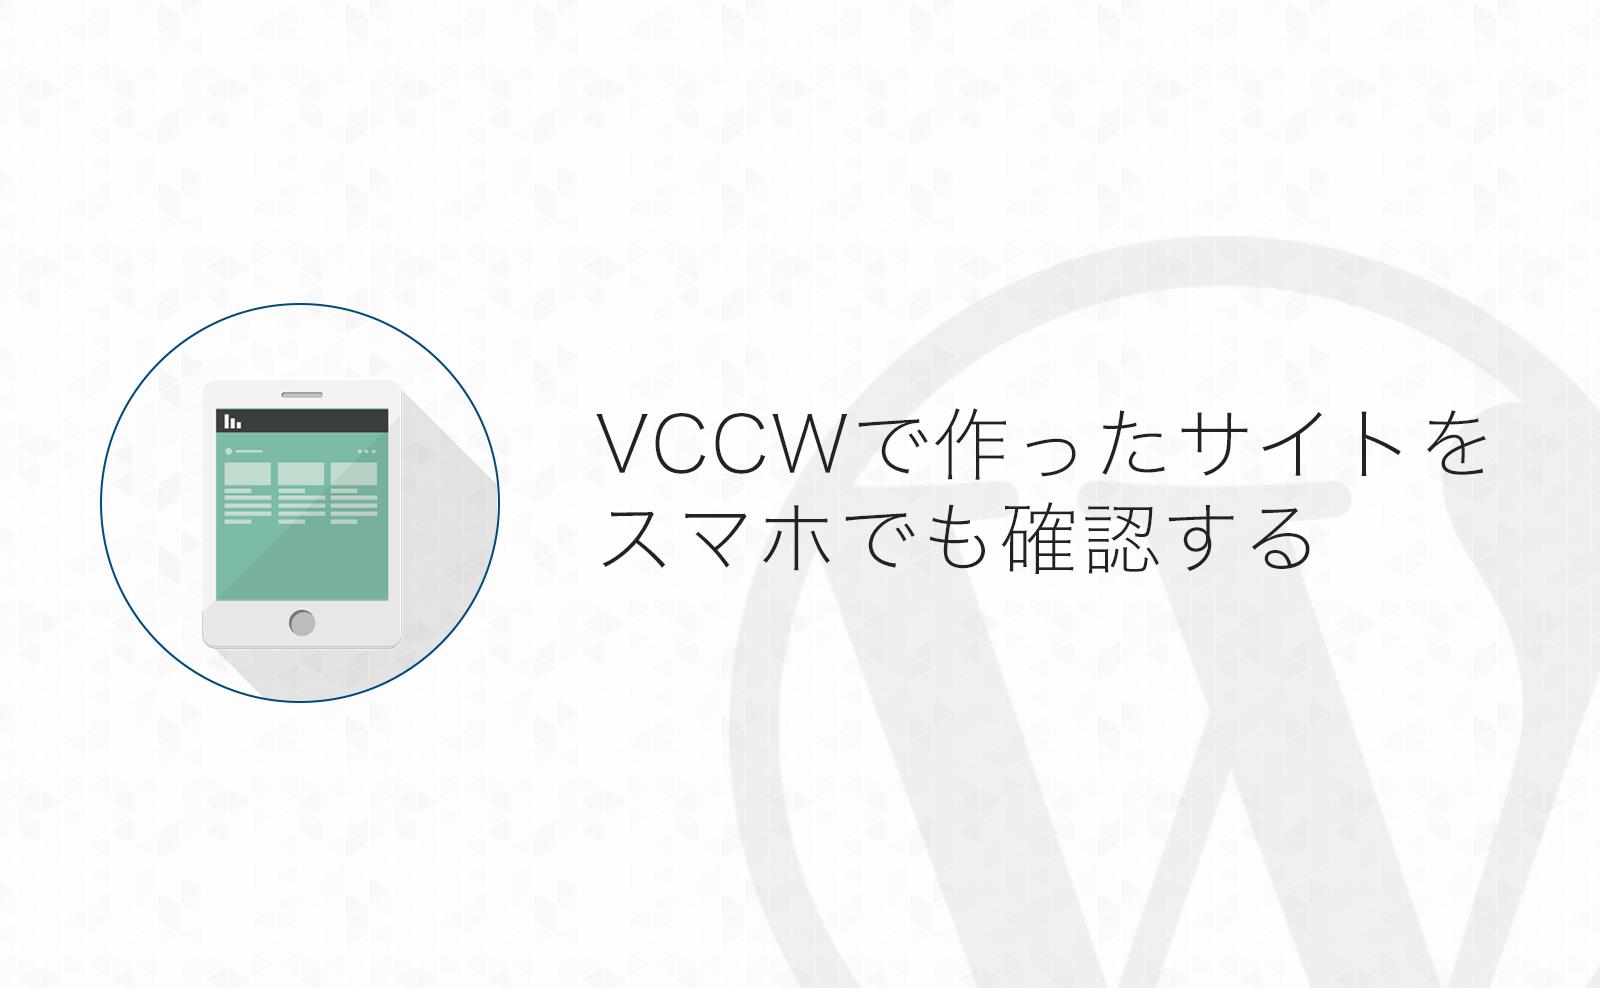 【WordPress】VCCWで製作中のサイトをスマホで確認する方法